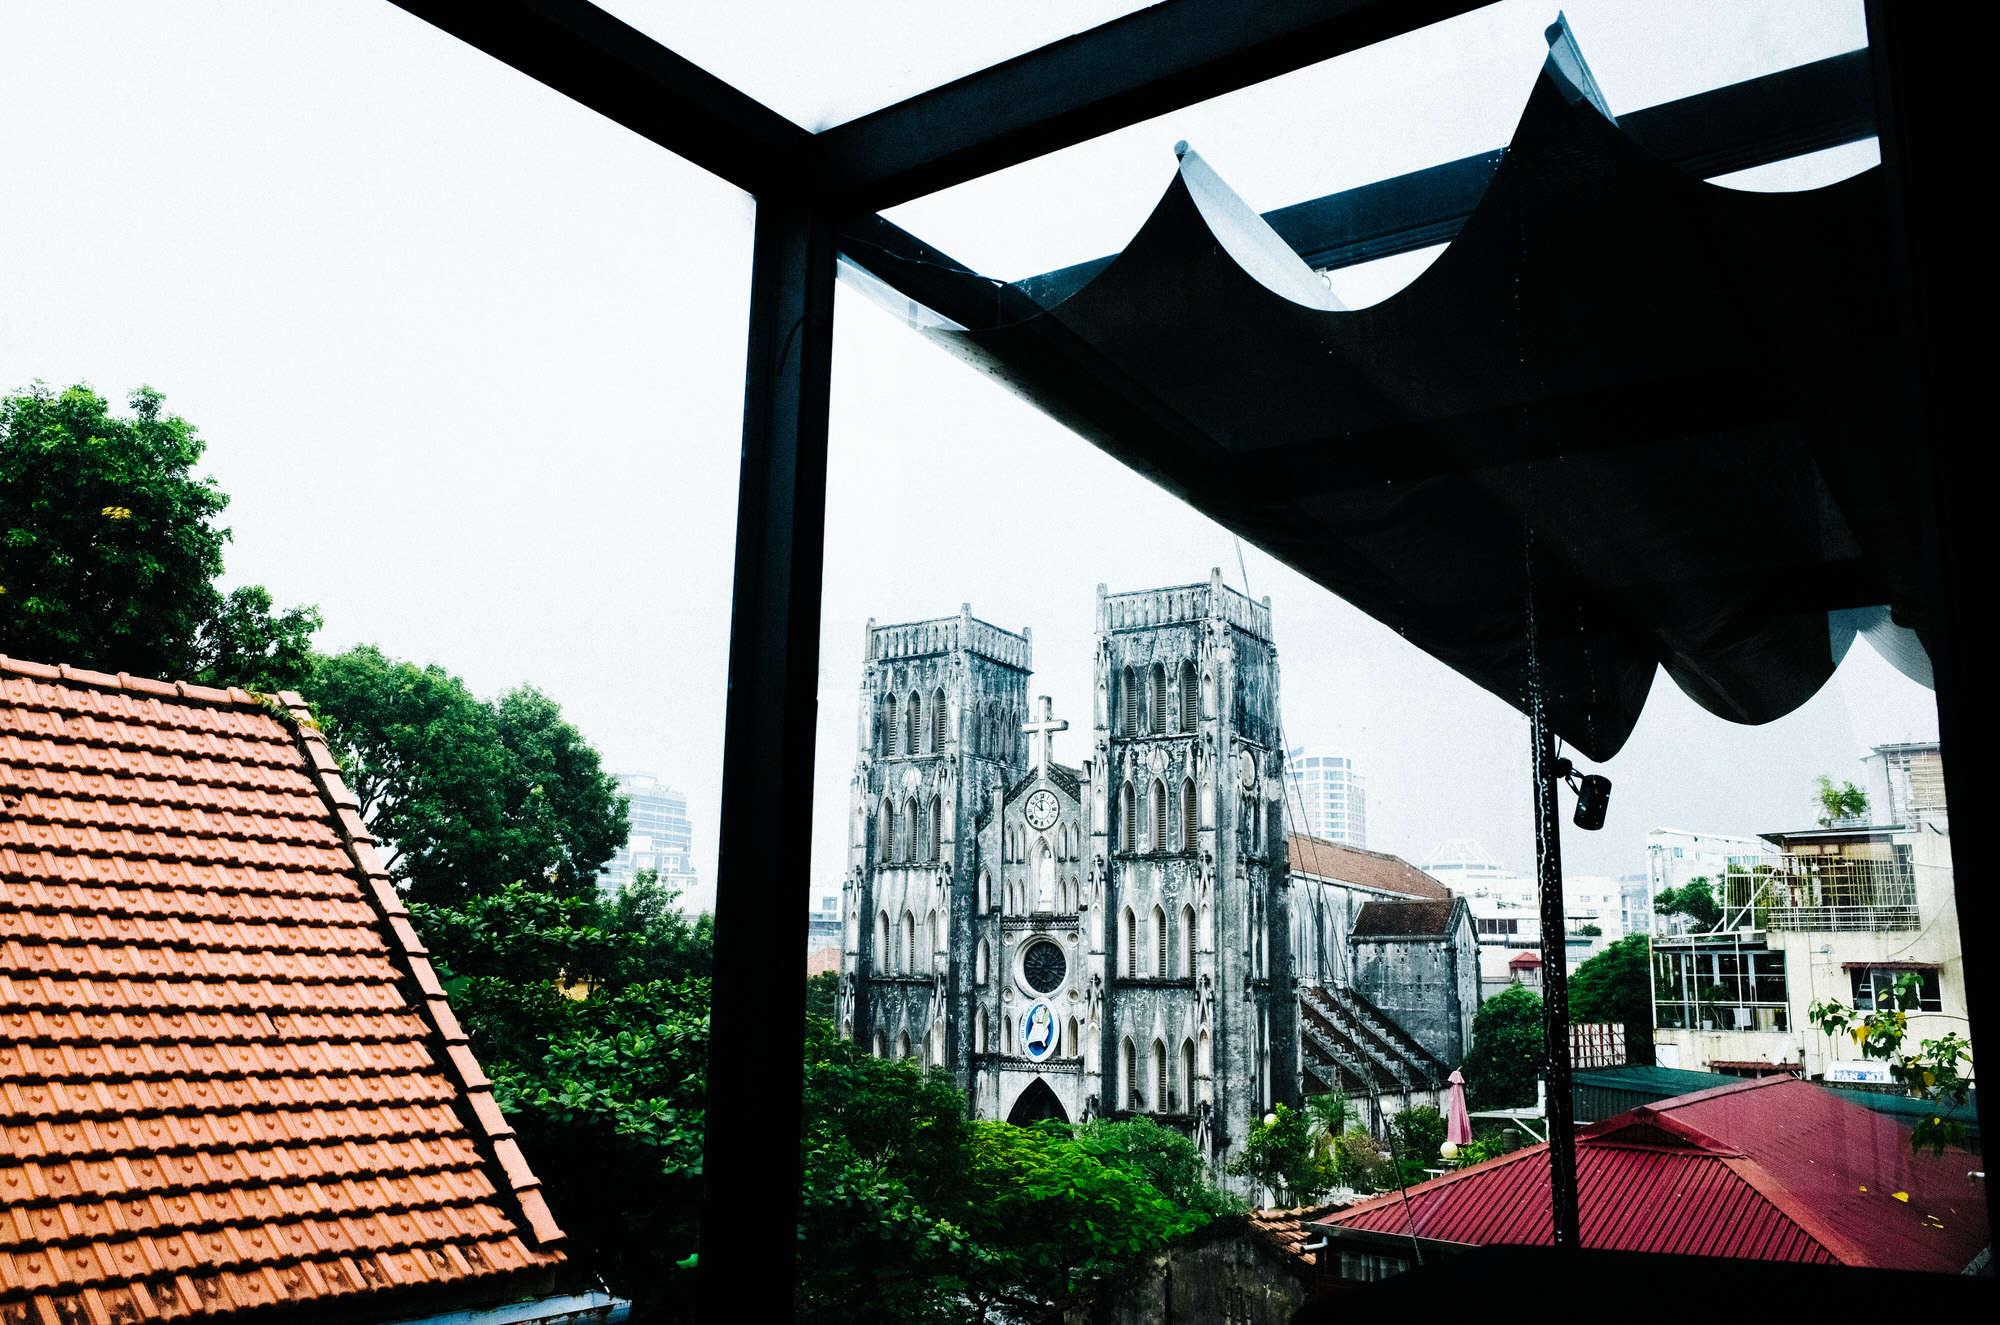 Hanoi, 2016. View from VSPRESSO